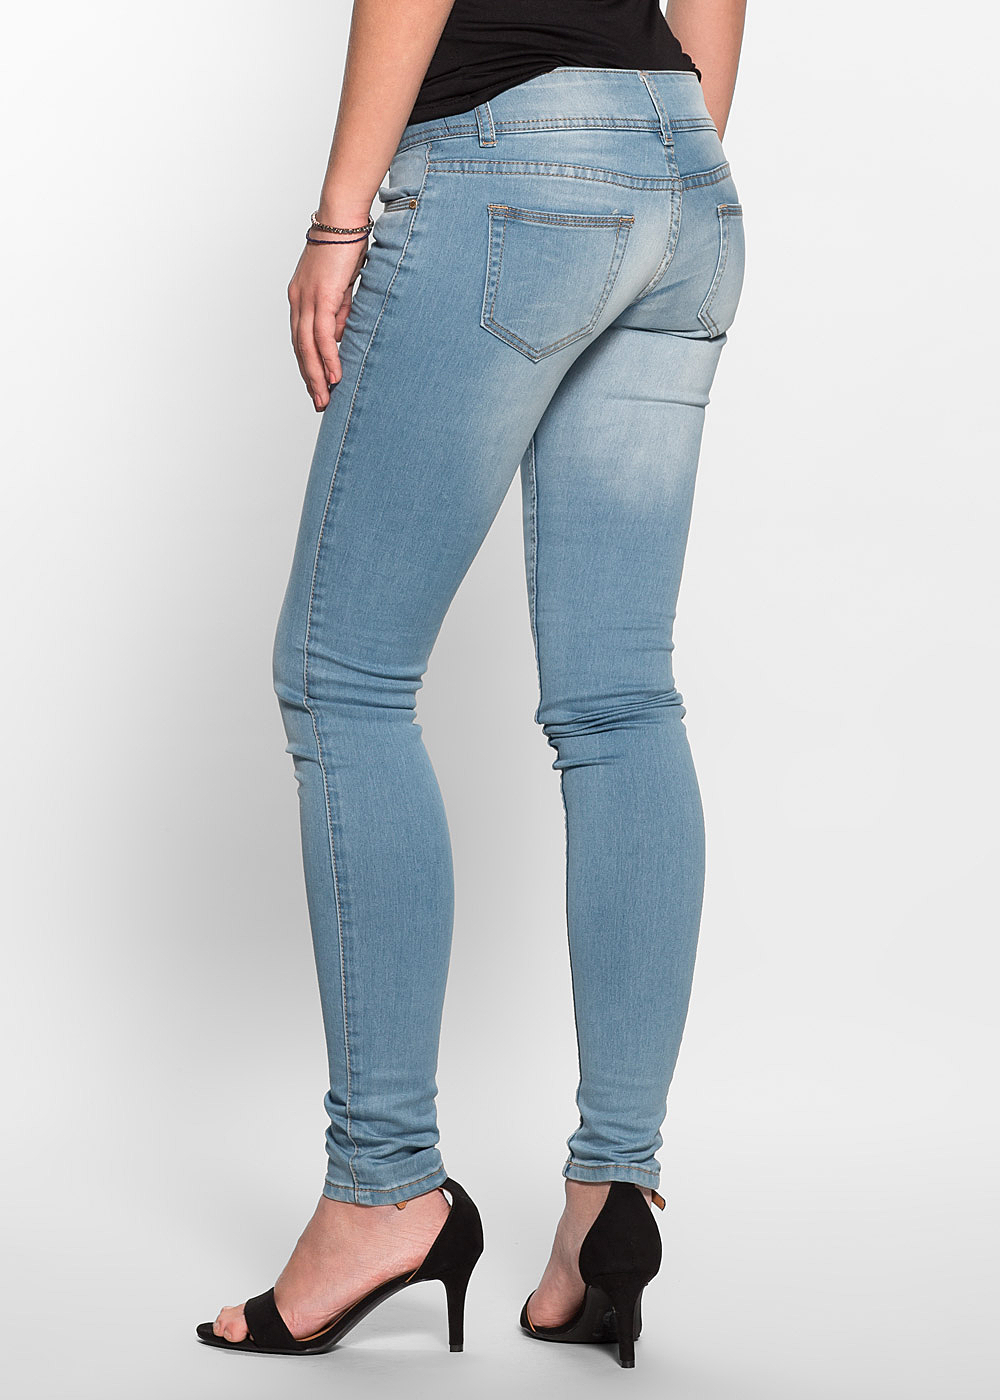 hailys damen jeans low waist 5 pocket style 2 kn pfe blau. Black Bedroom Furniture Sets. Home Design Ideas